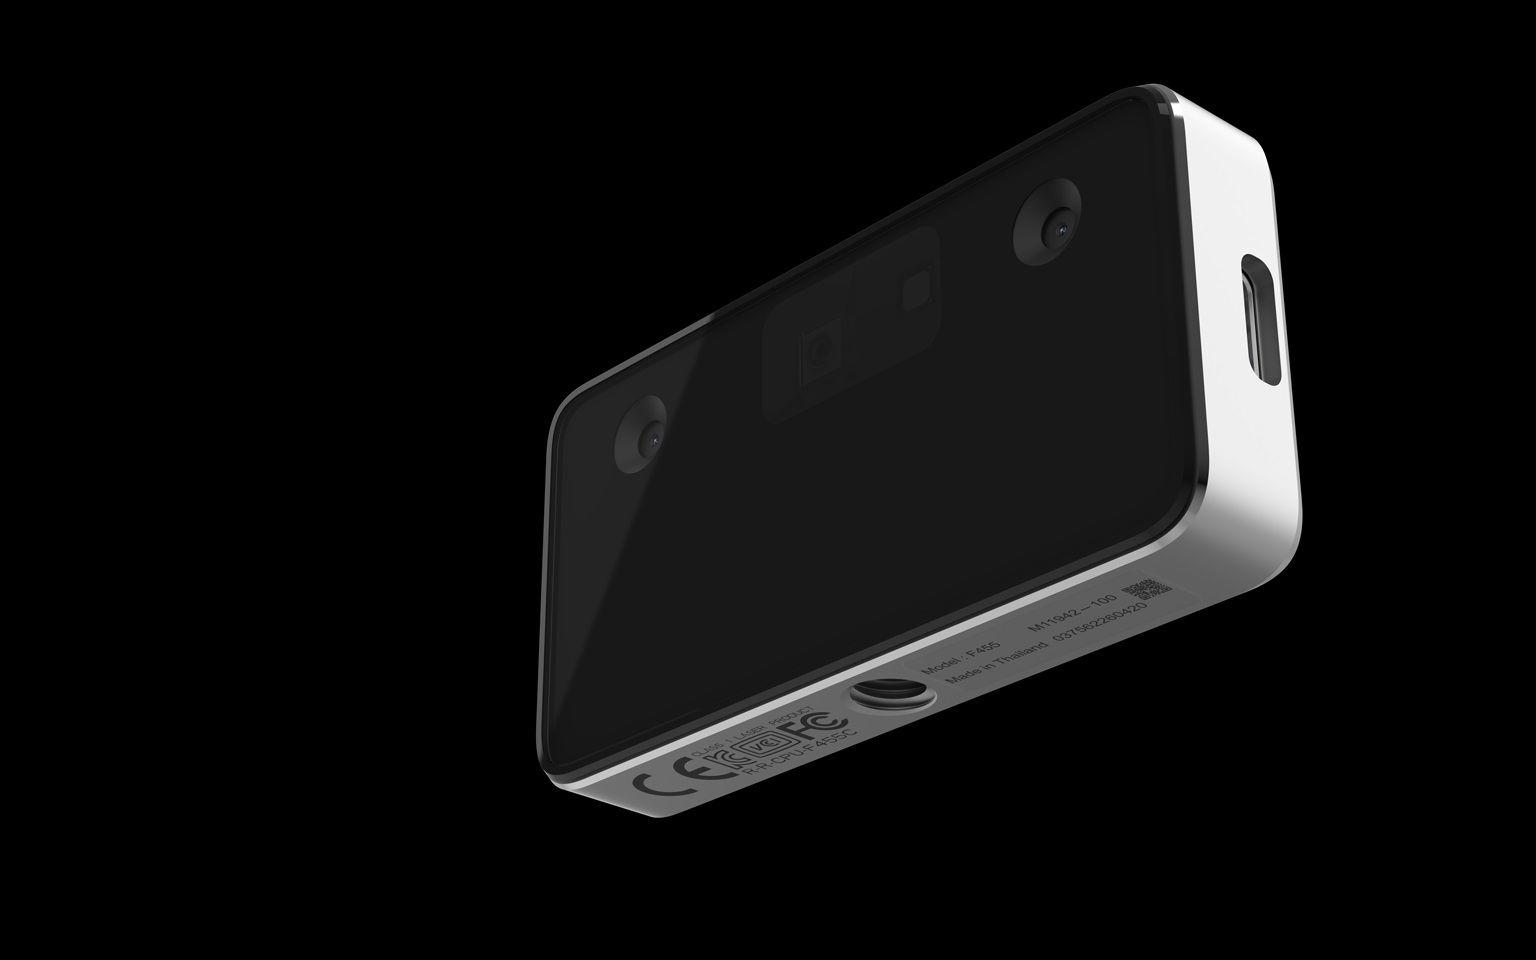 La caméra RealSense ID créée par Intel